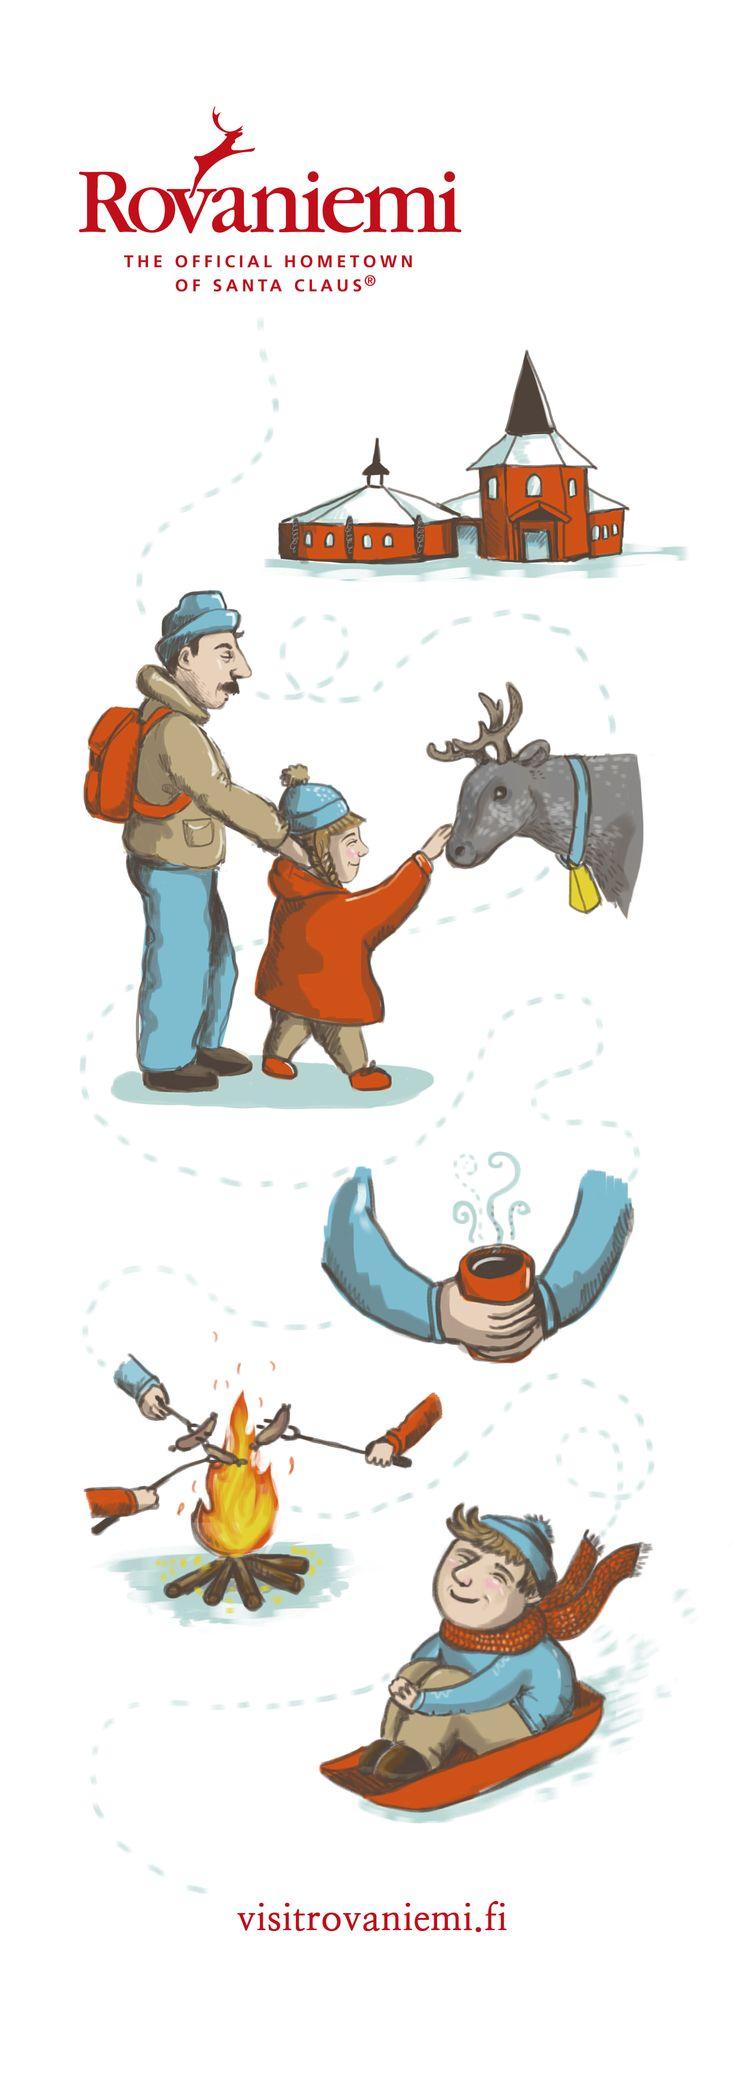 Schoolwork,  Imagined advertising for visitrovaniemi.fi By Mikko Roininen #Rovaniemi #illustration #visitrovaniemi